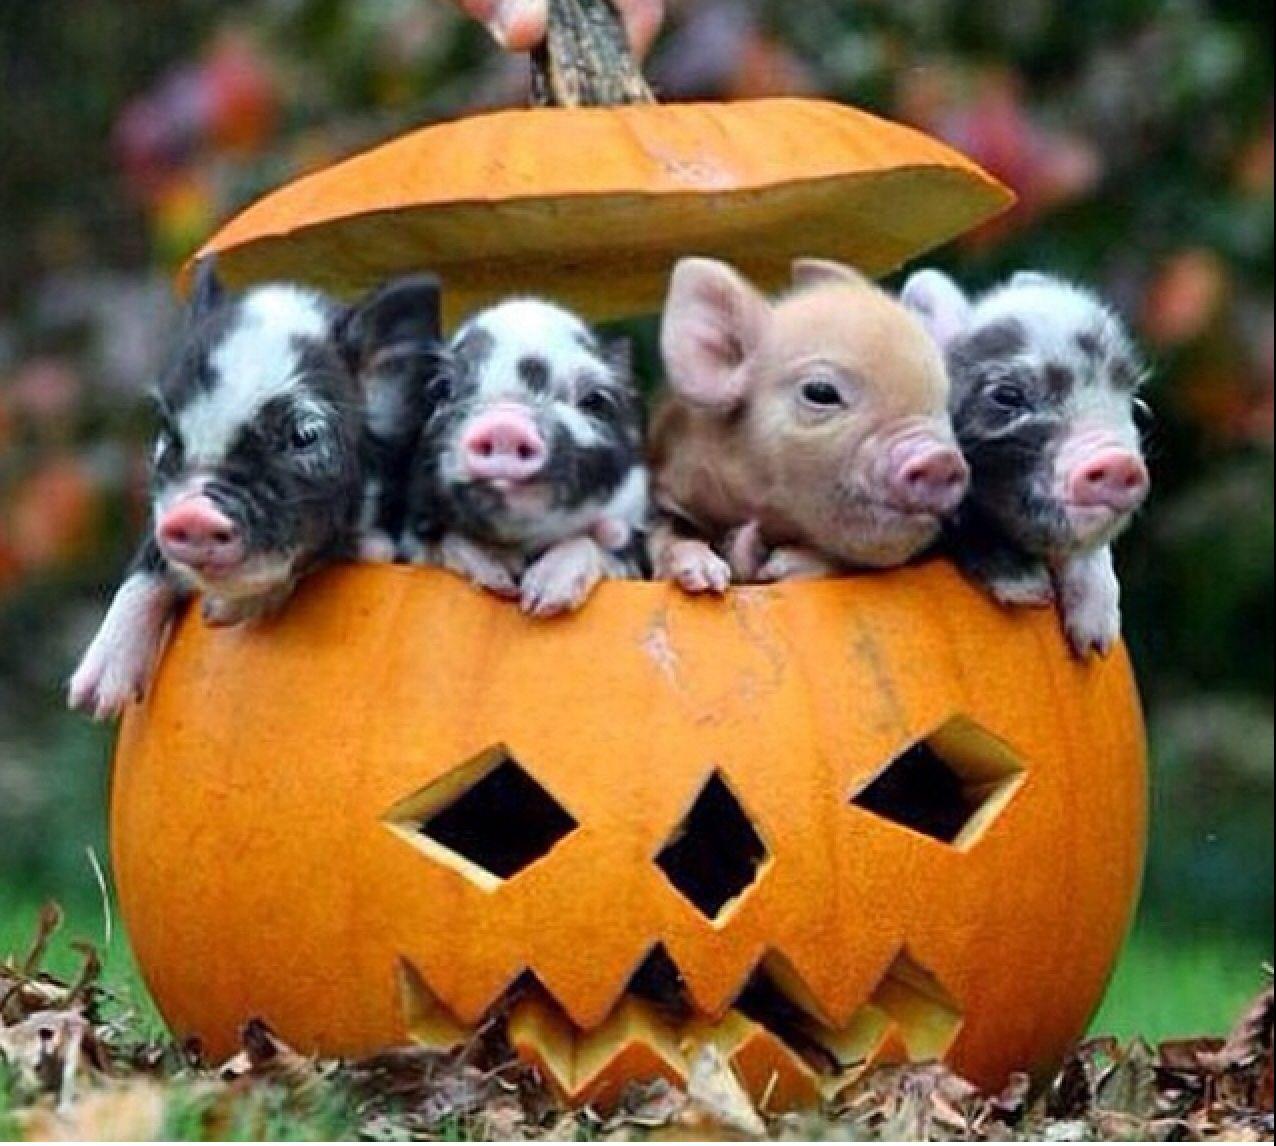 Happy Halloween! Pumpkin fun! Yes....I love it